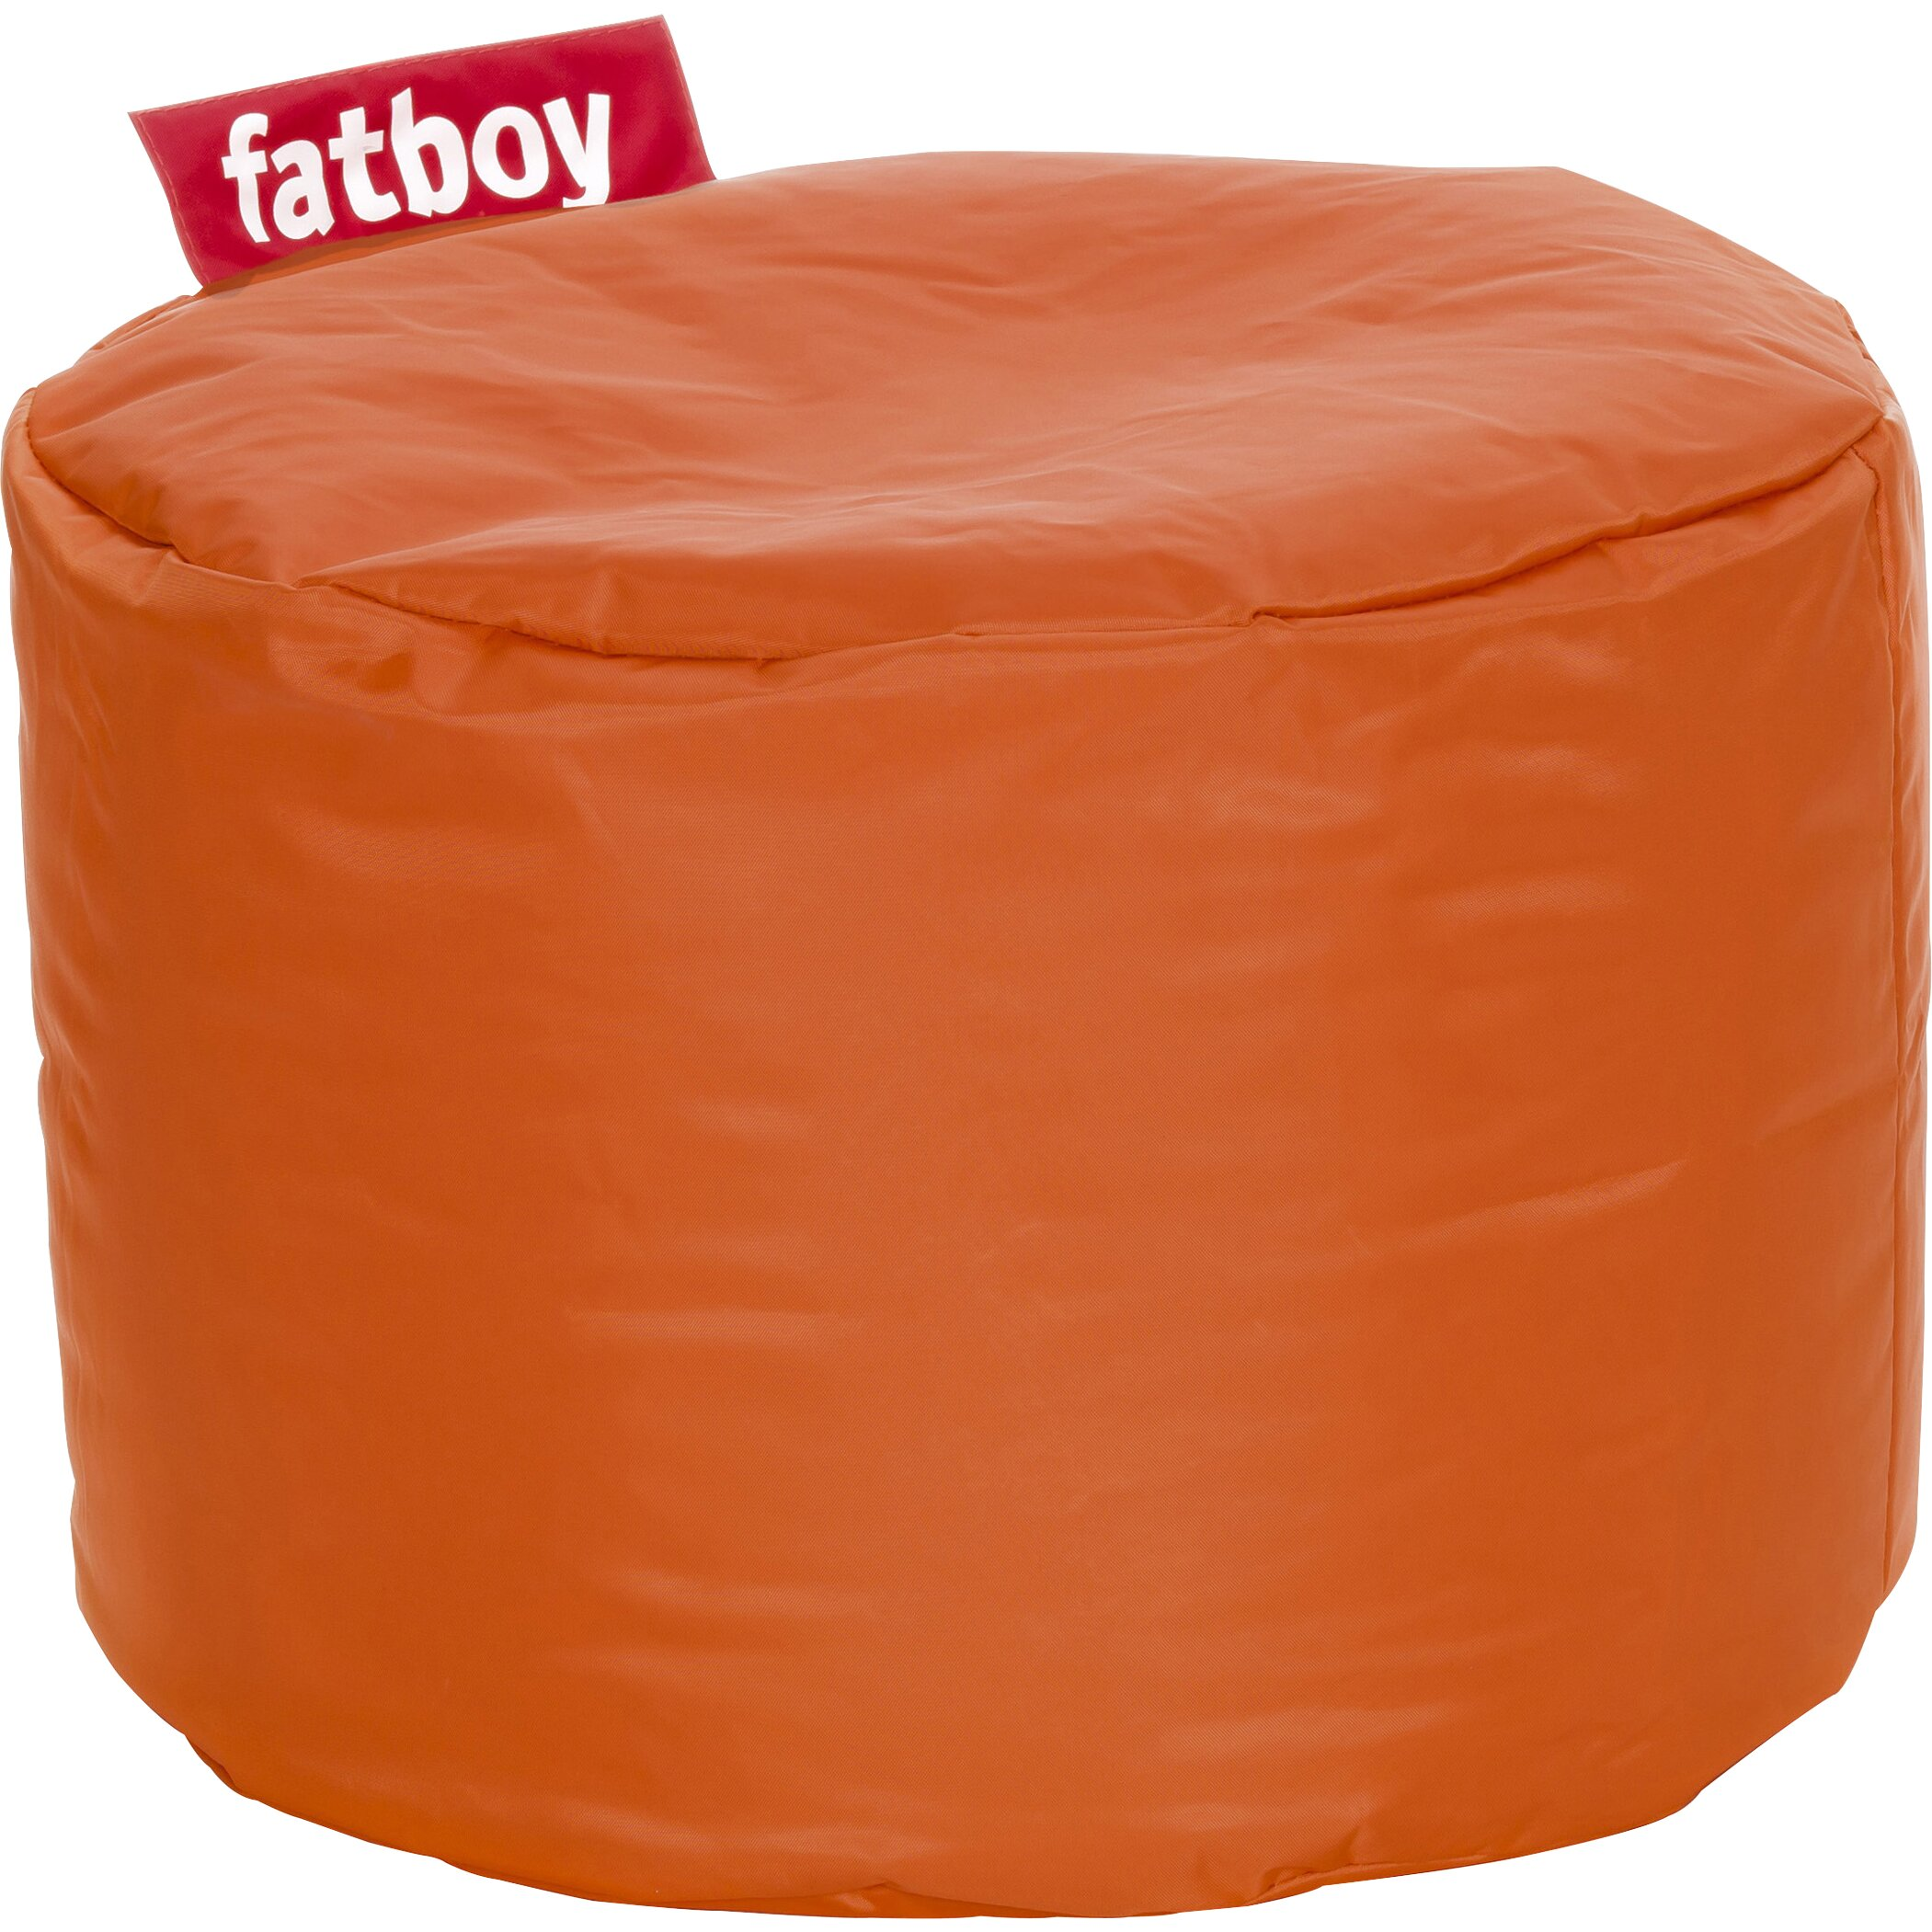 Fatboy Bean Bag Living Room